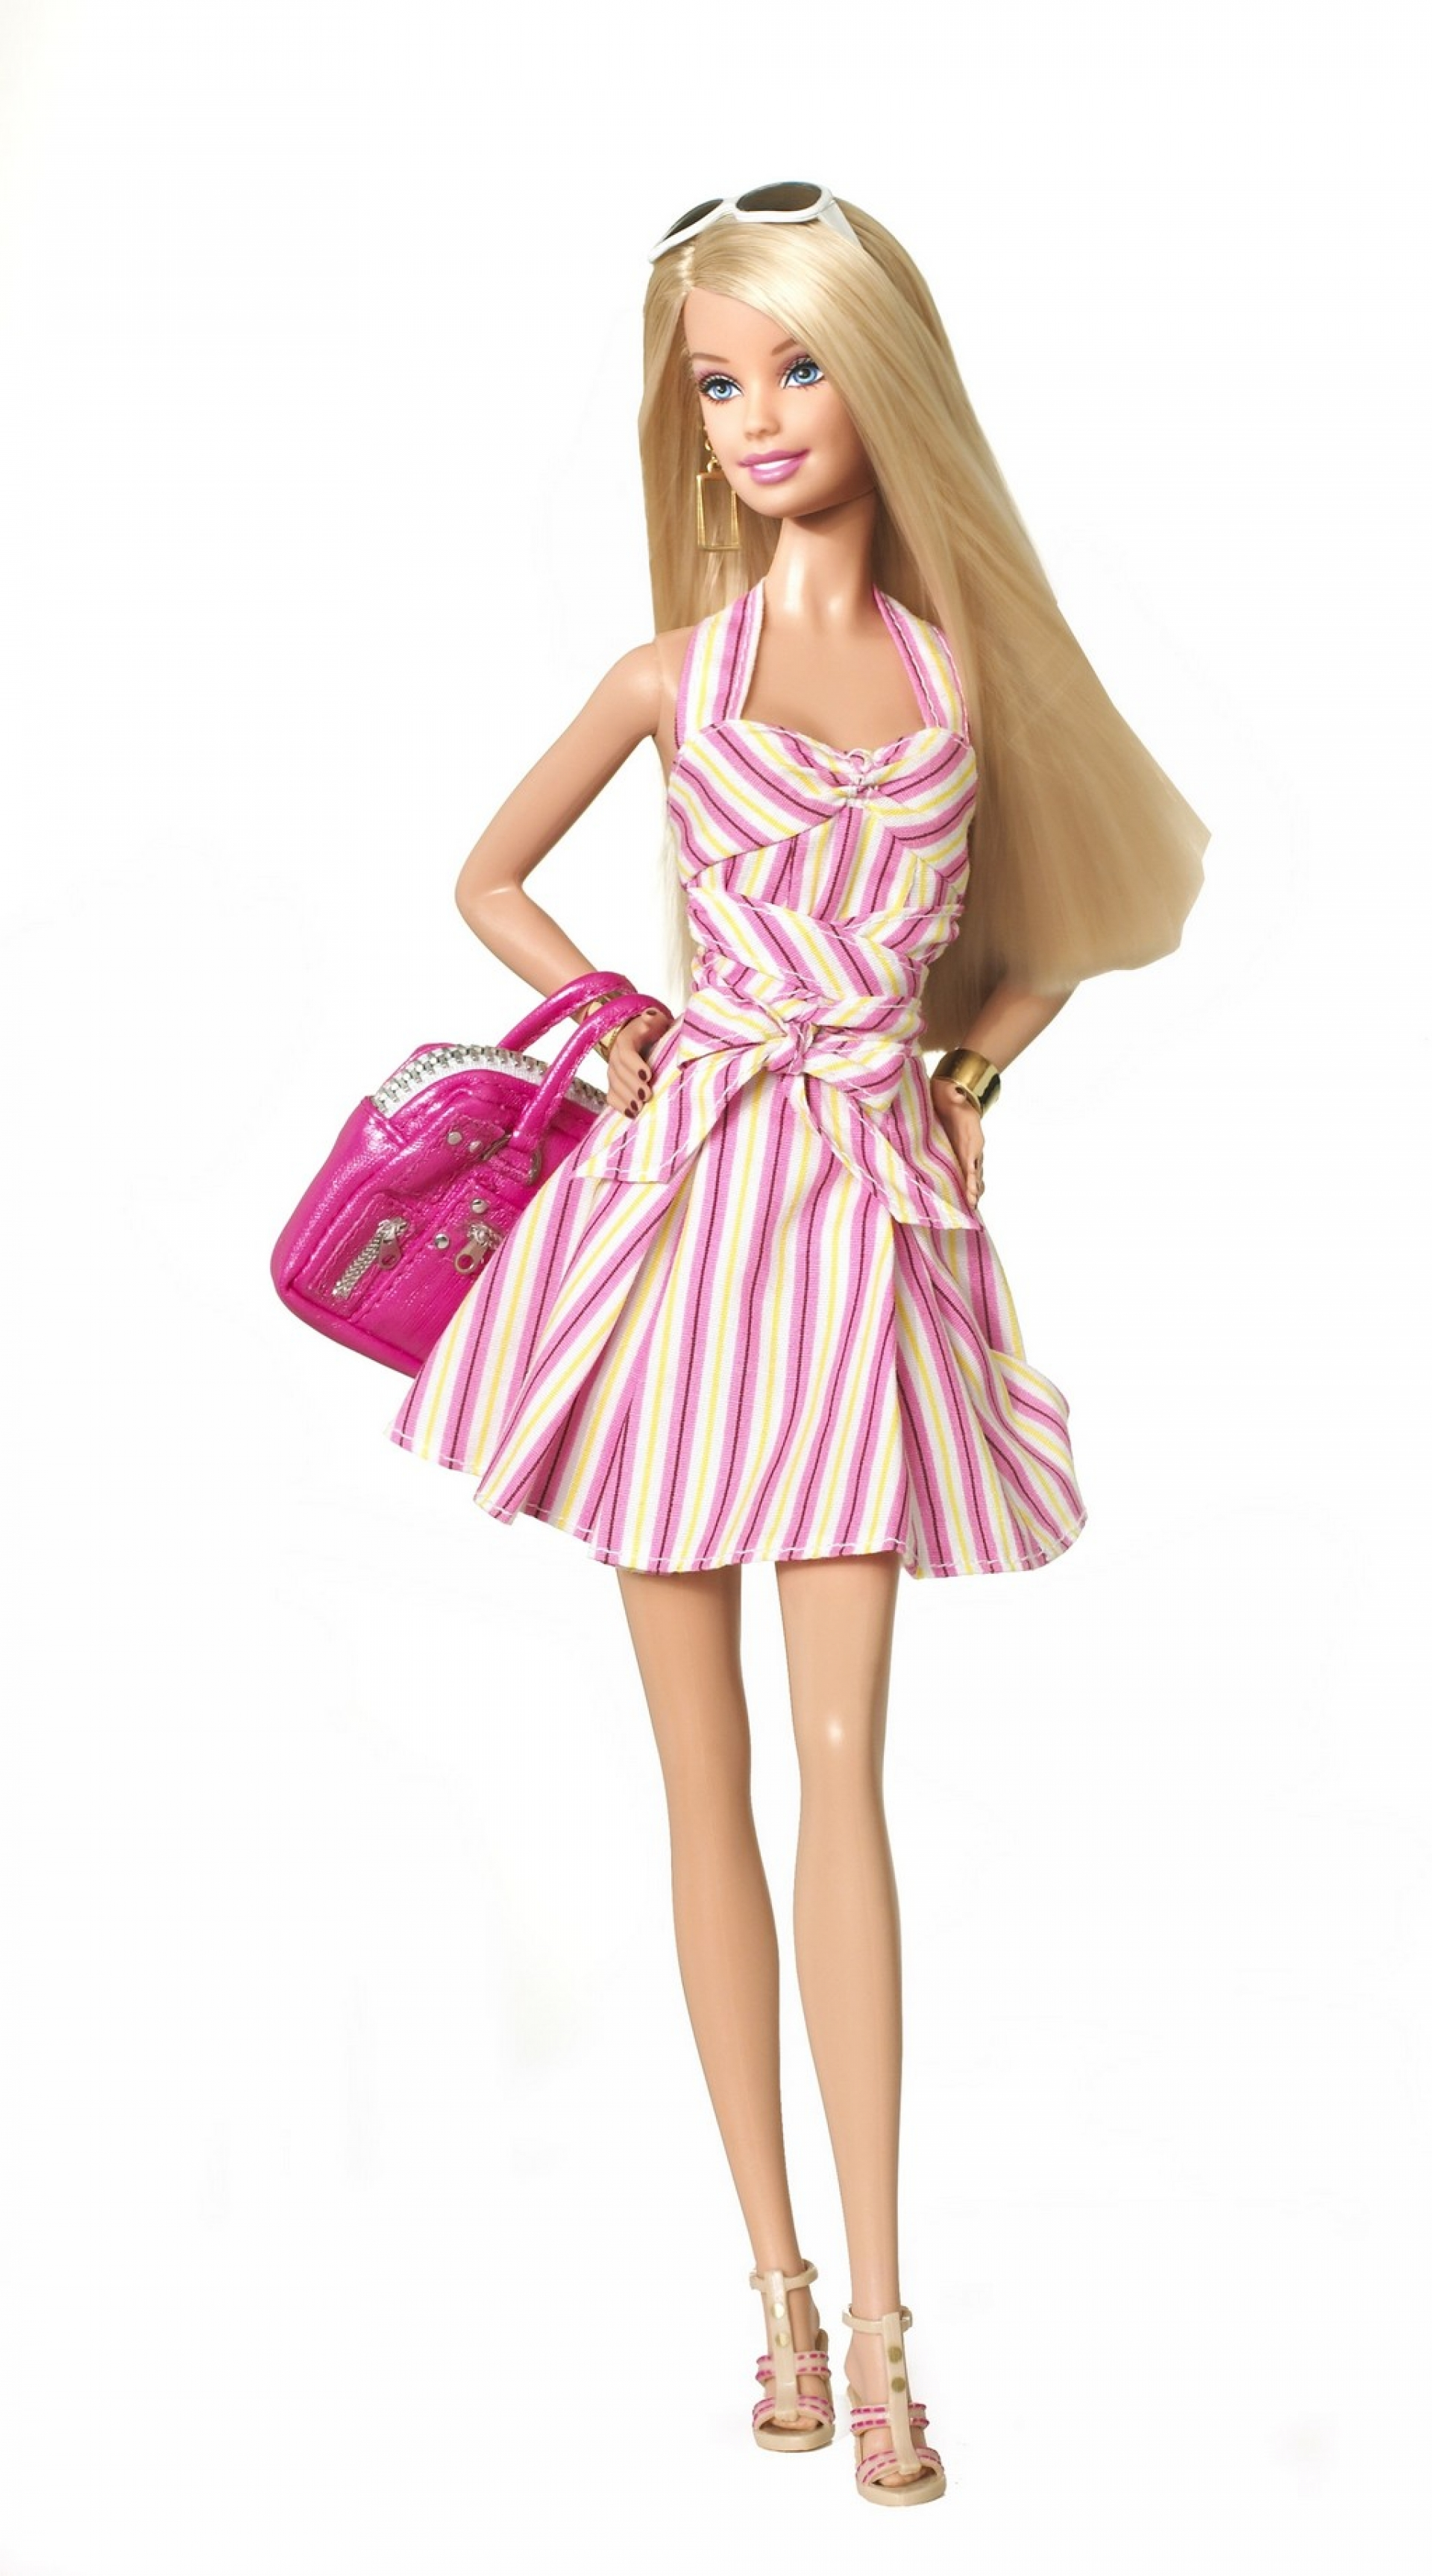 barbie clip art #14 - Barbie Clipart